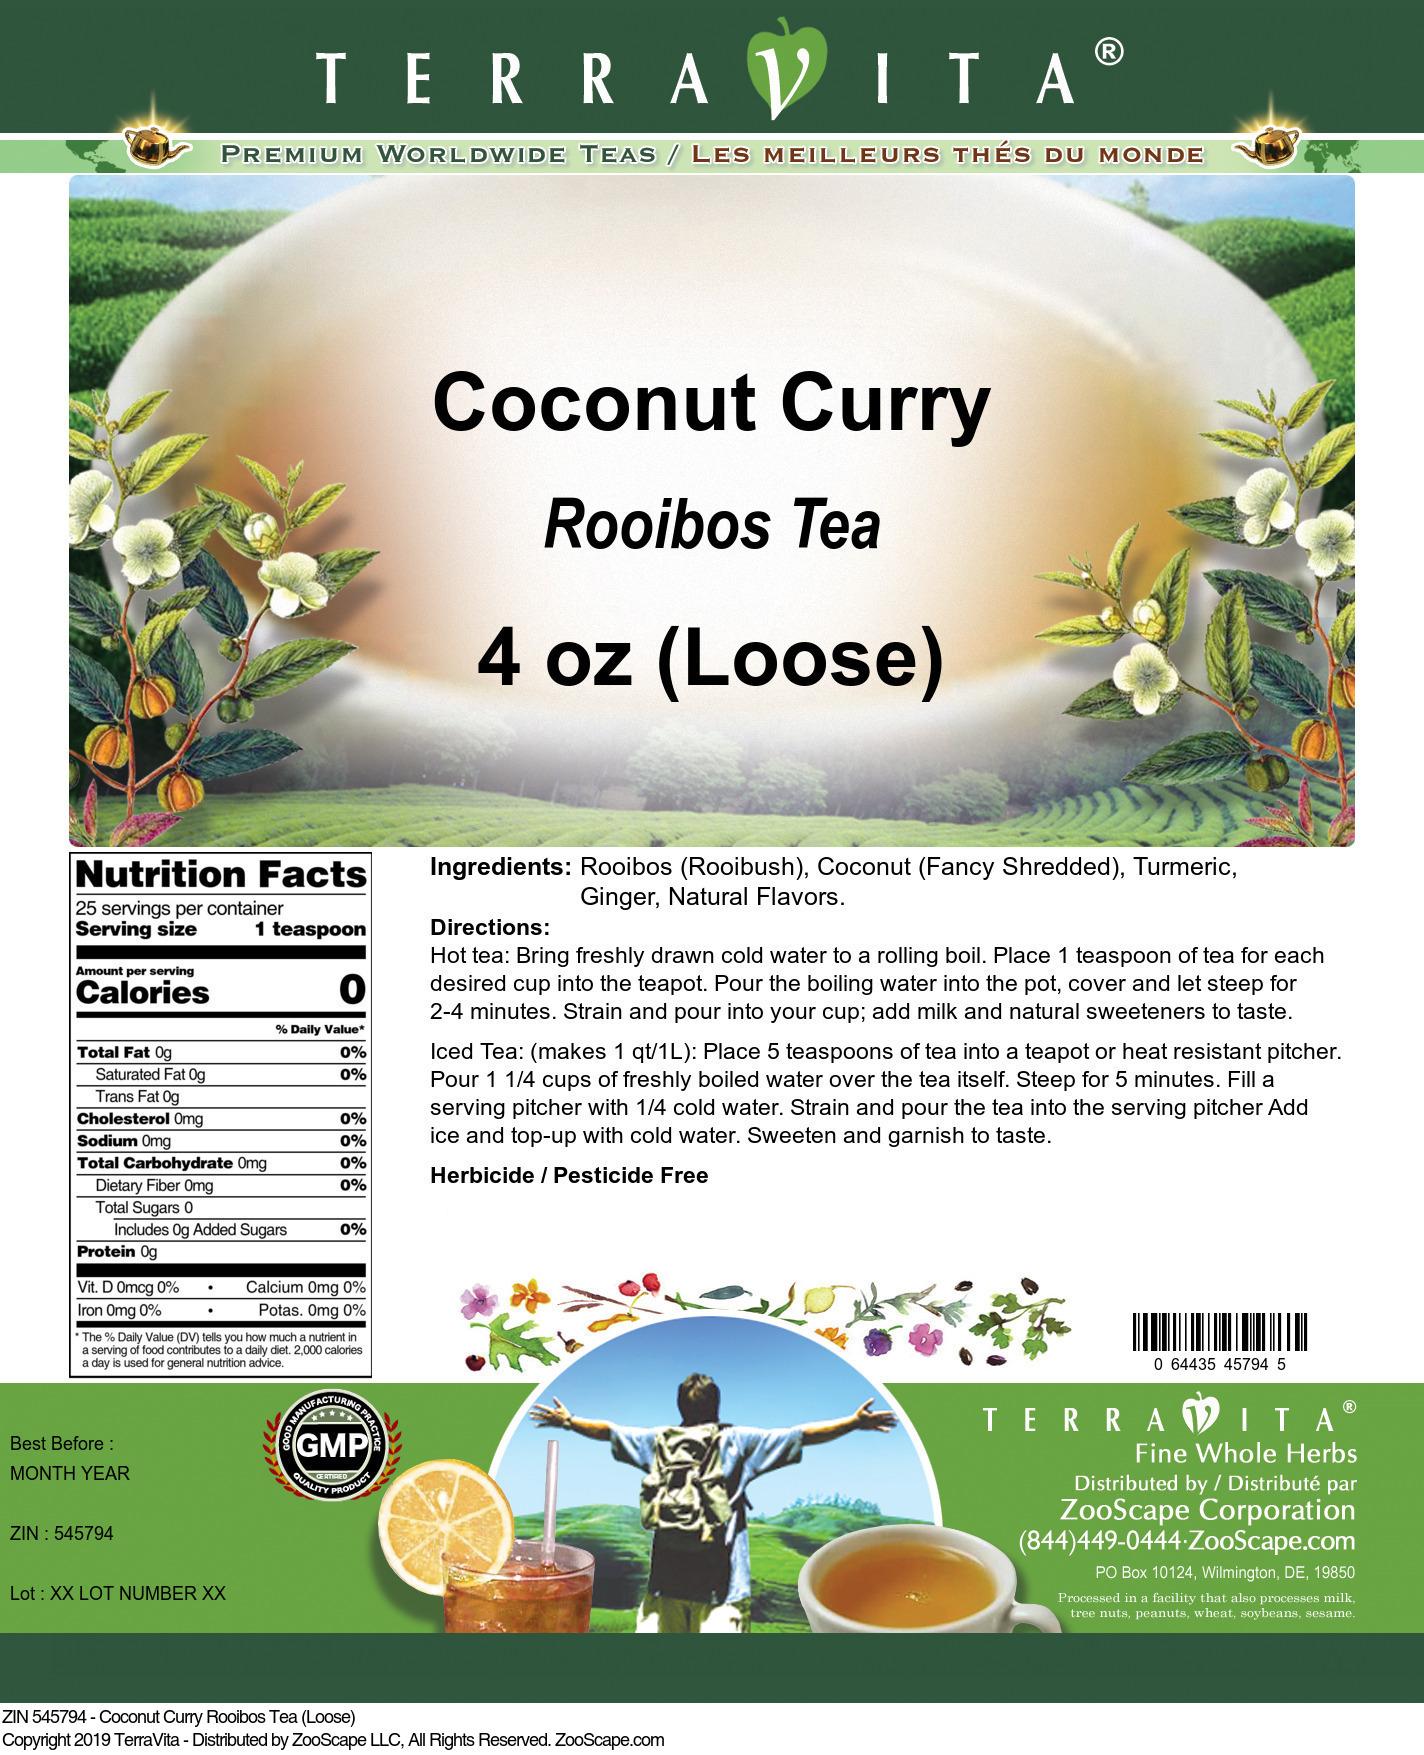 Coconut Curry Rooibos Tea (Loose)